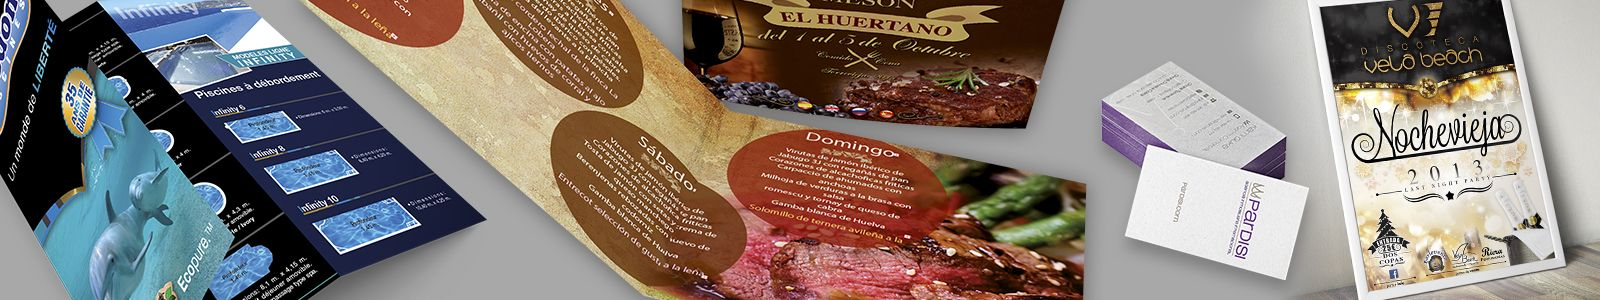 Publicidad en Torrevieja – Imprenta en Torrevieja – Gráficas Xpress